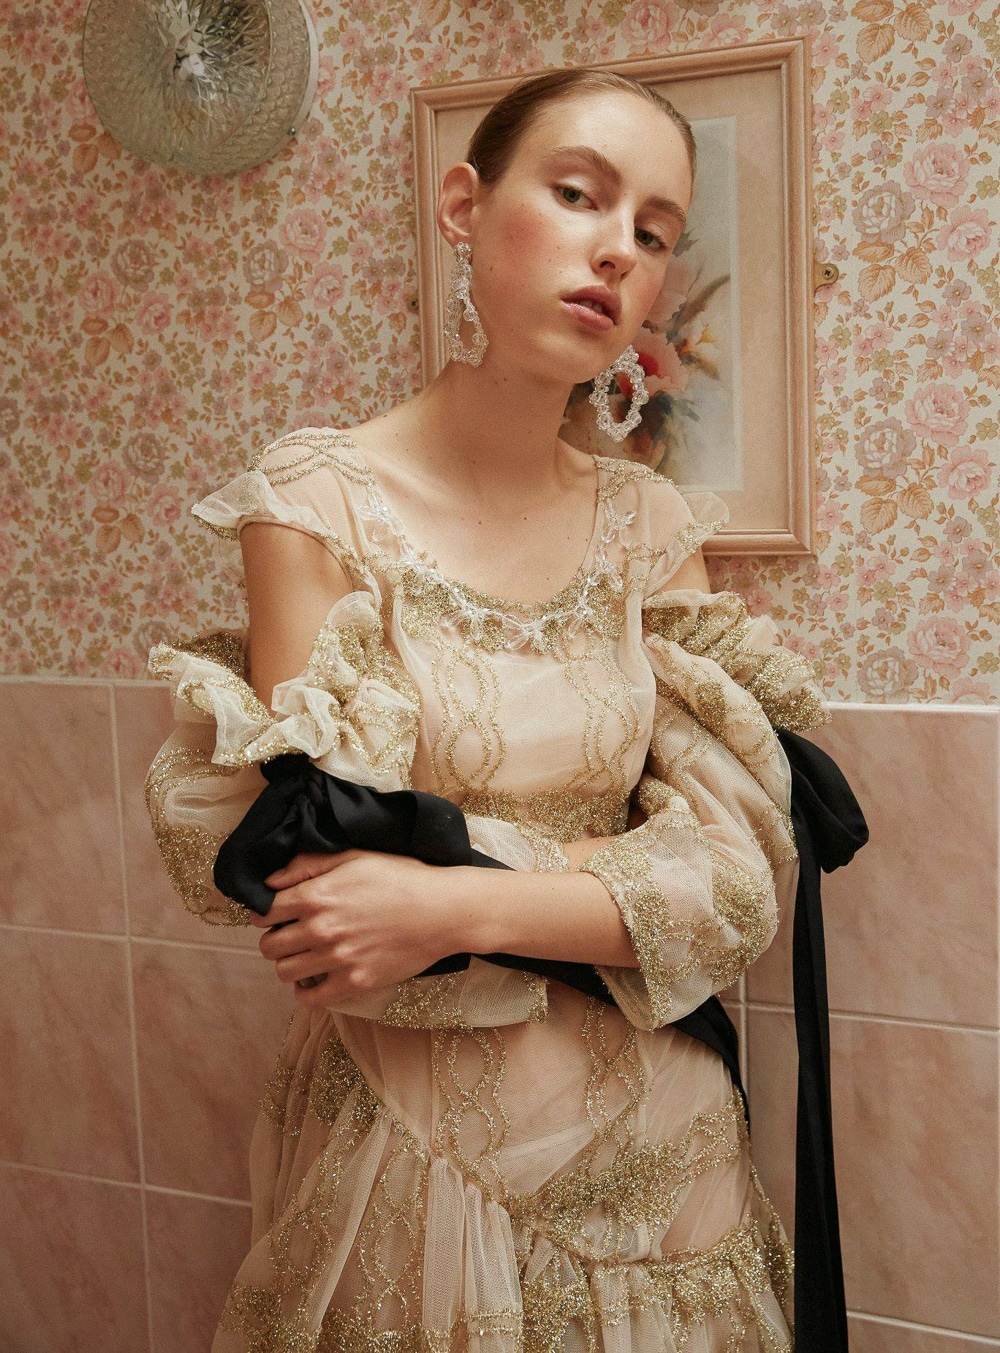 Ina-Lekiewicz-Vogue-Poland-Pia-Priewe-8.jpg